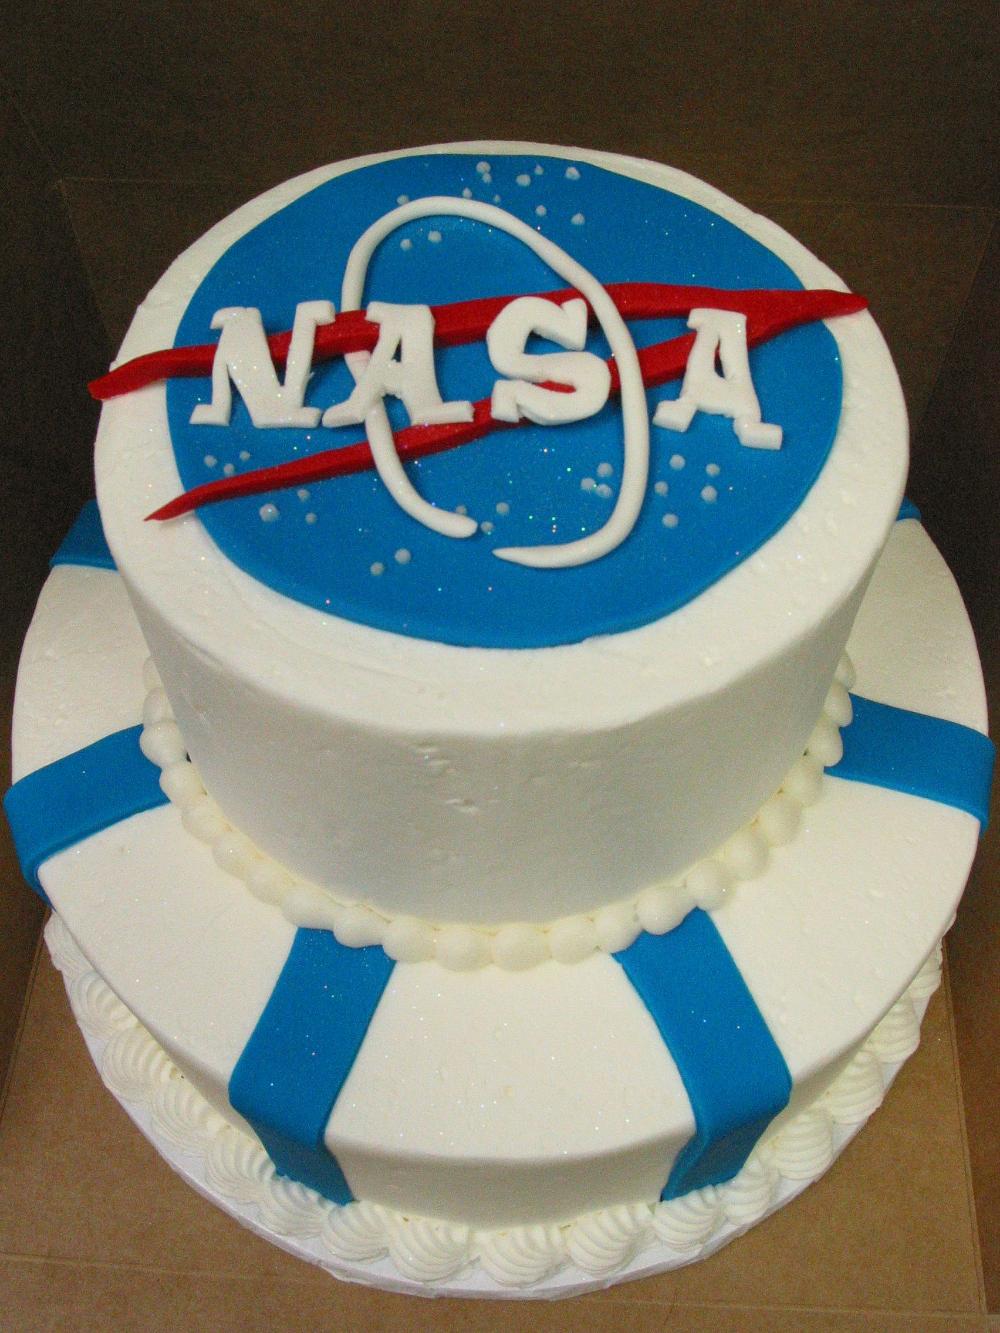 nasa birthday cake ideas Google Search Cake, Grooms